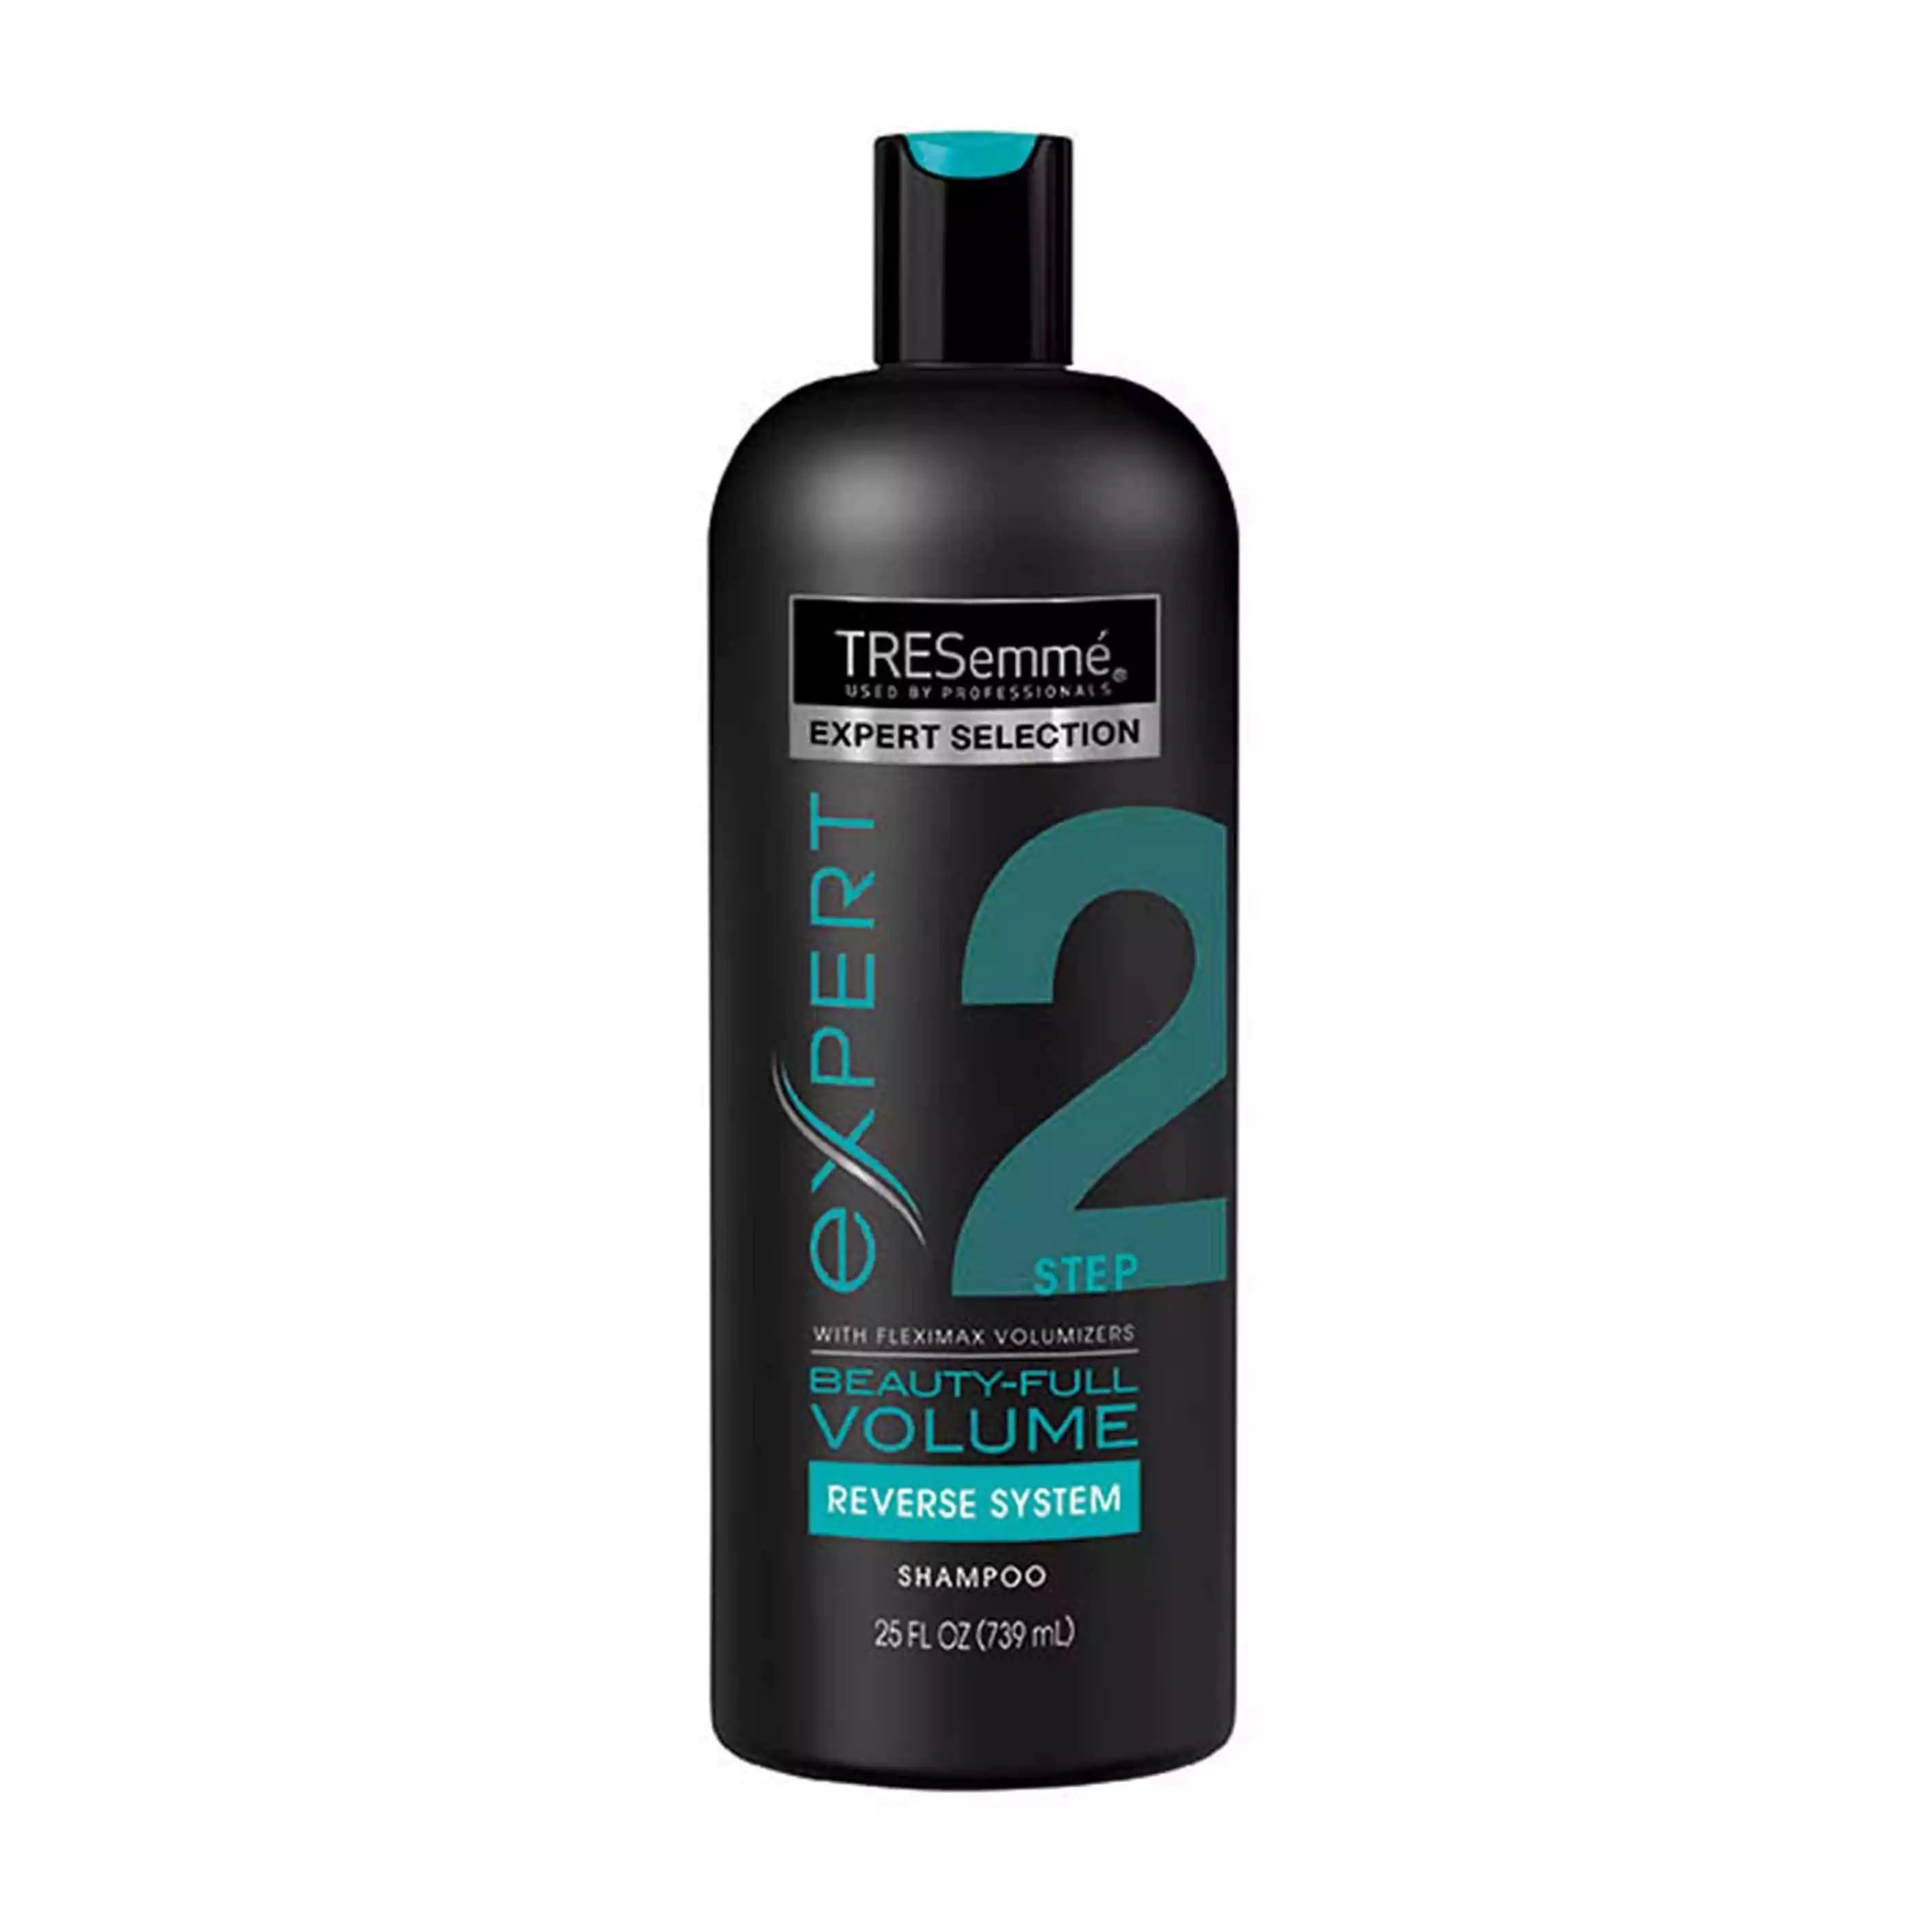 TRESemme Beauty-Full Volume Shampoo